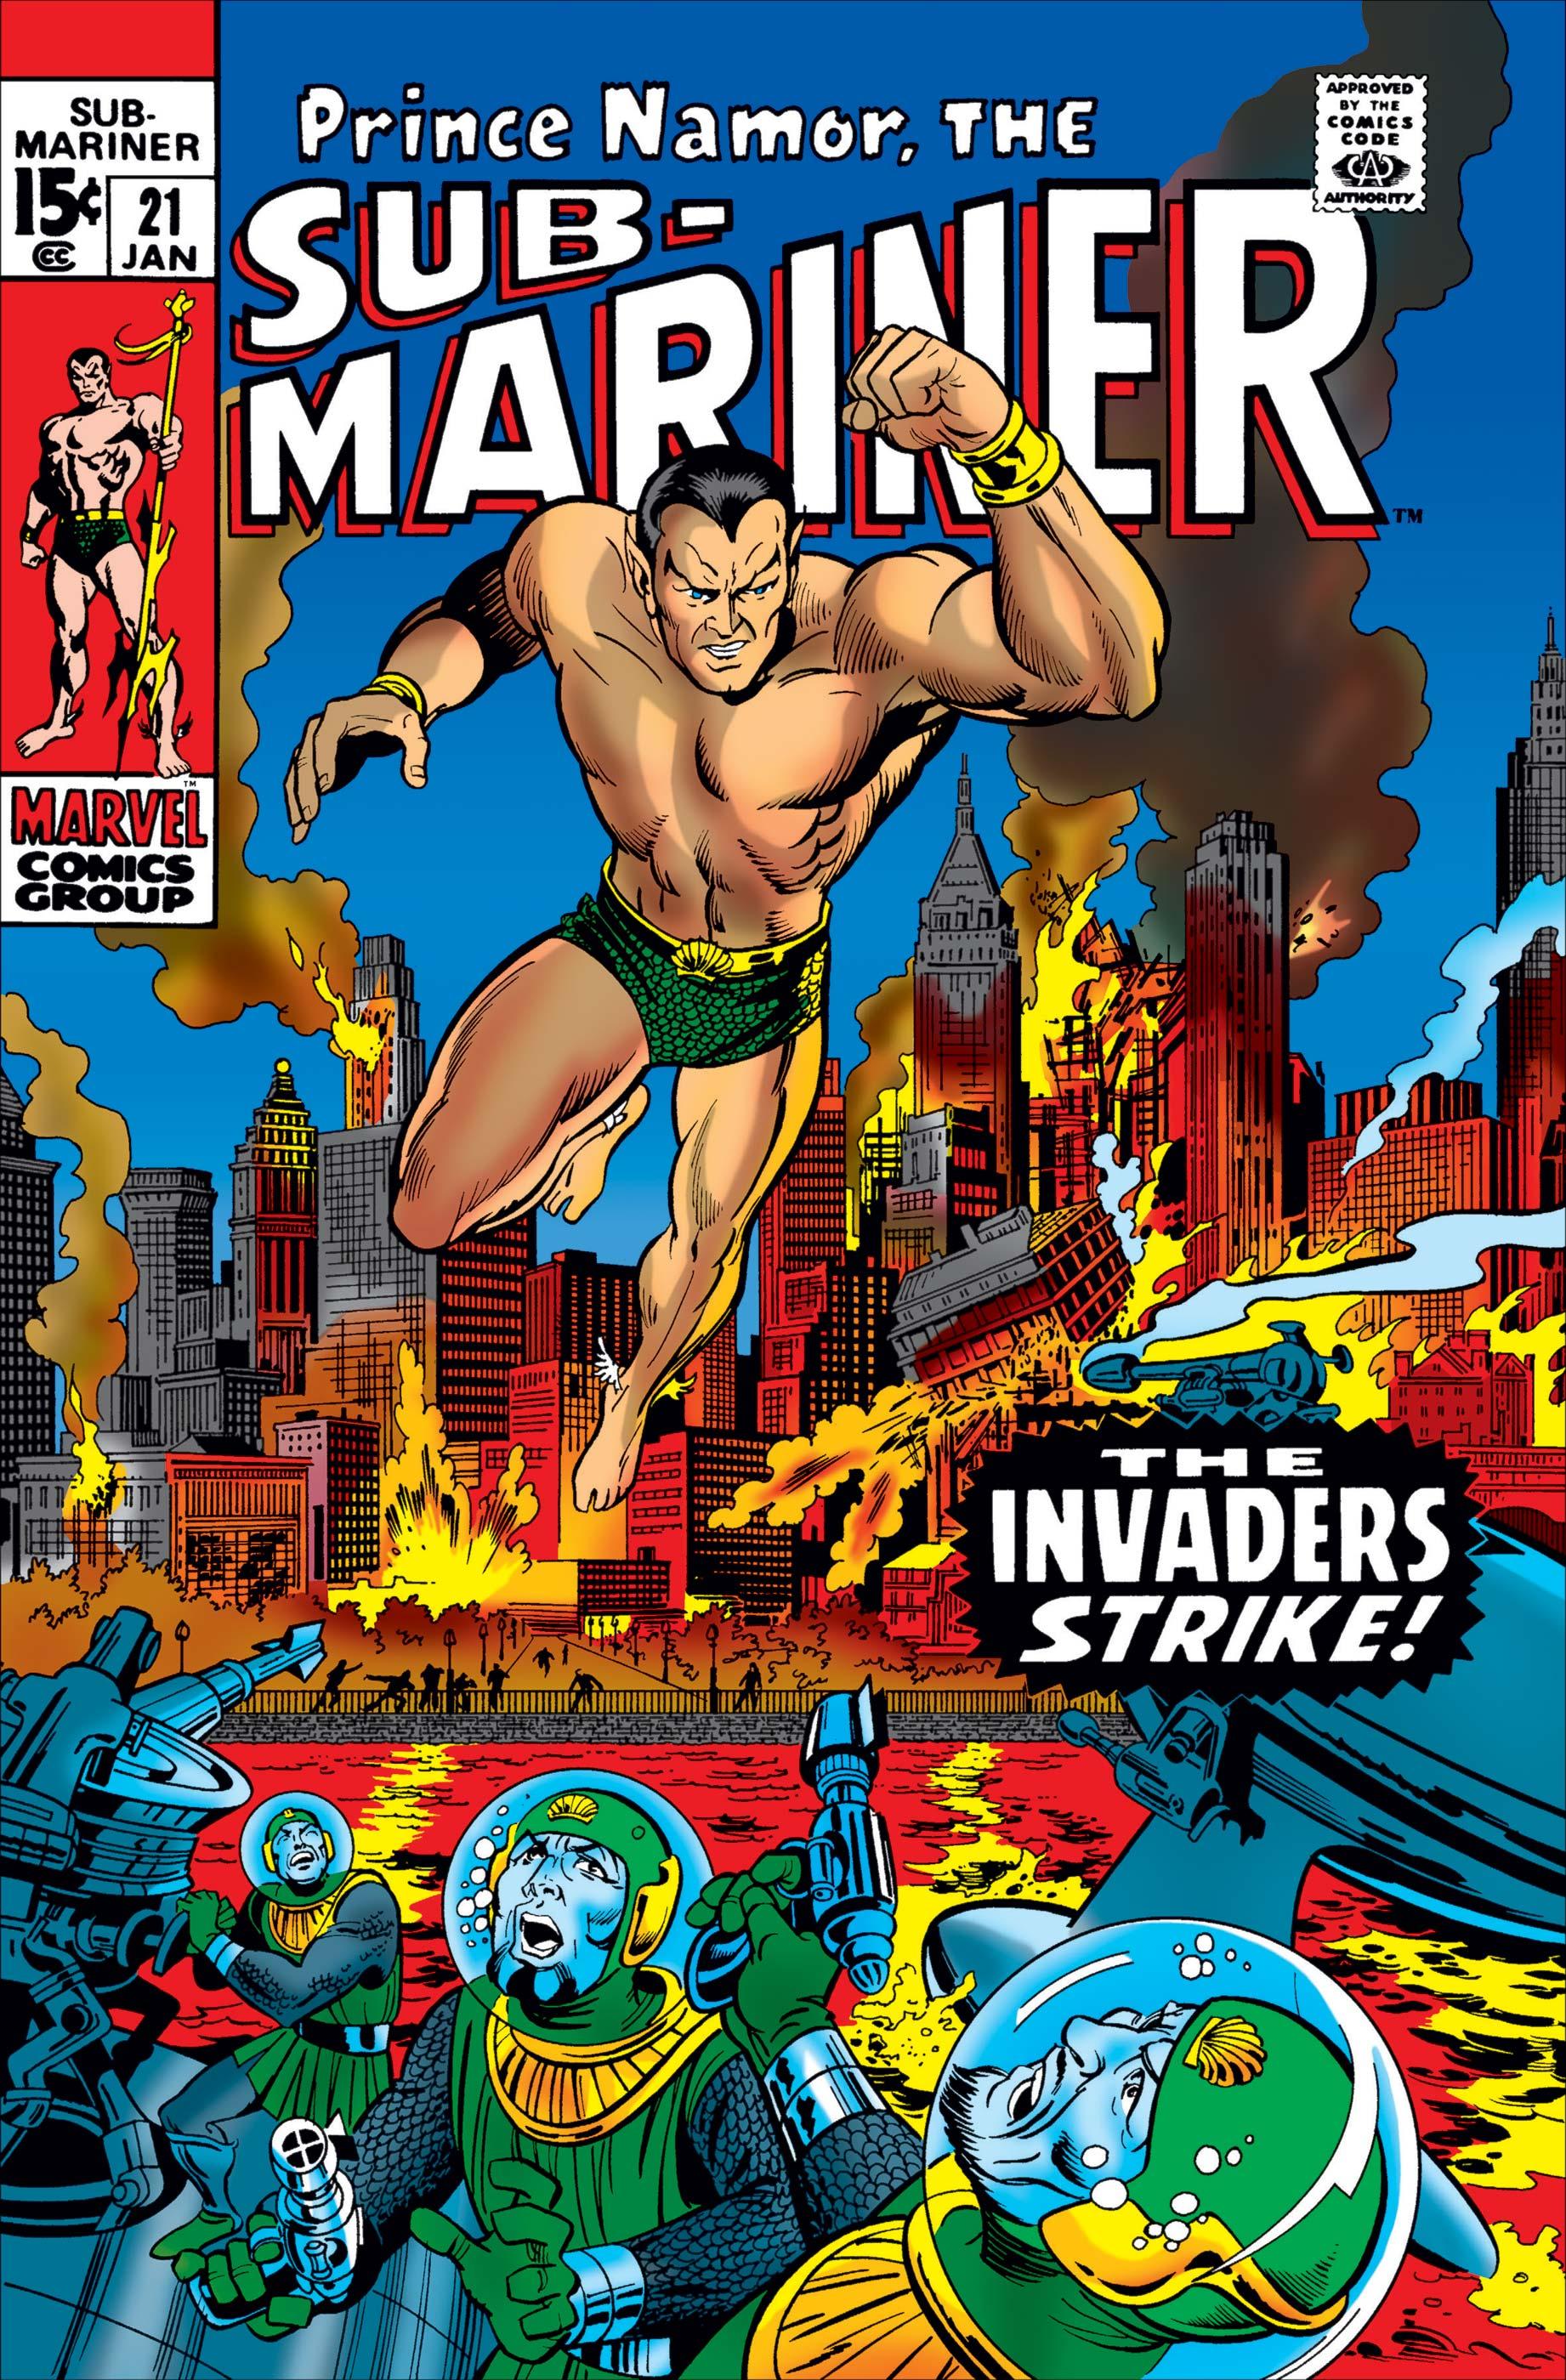 Sub-Mariner (1968) #21